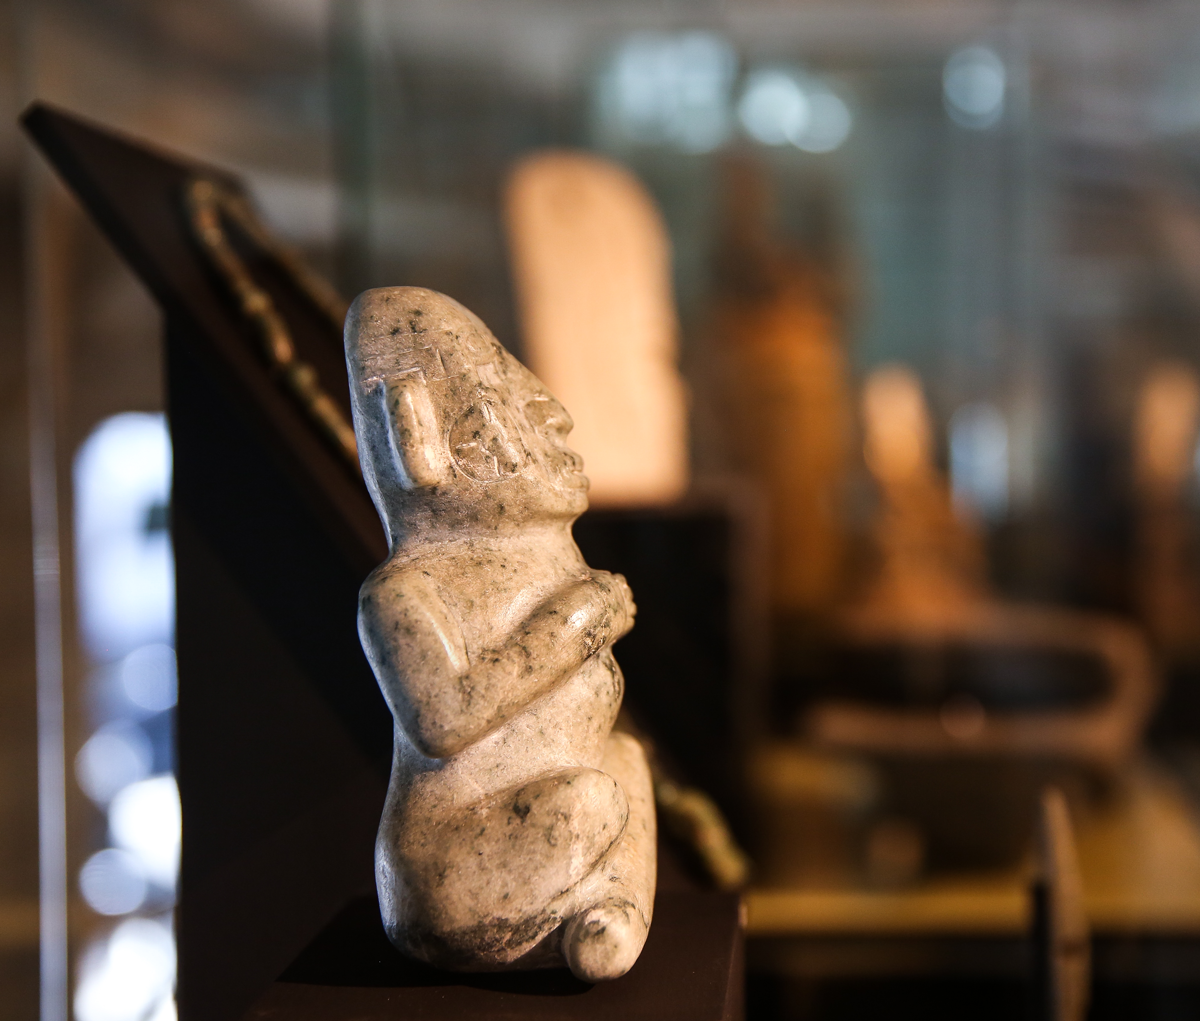 Cultura maya - Hombre sentado